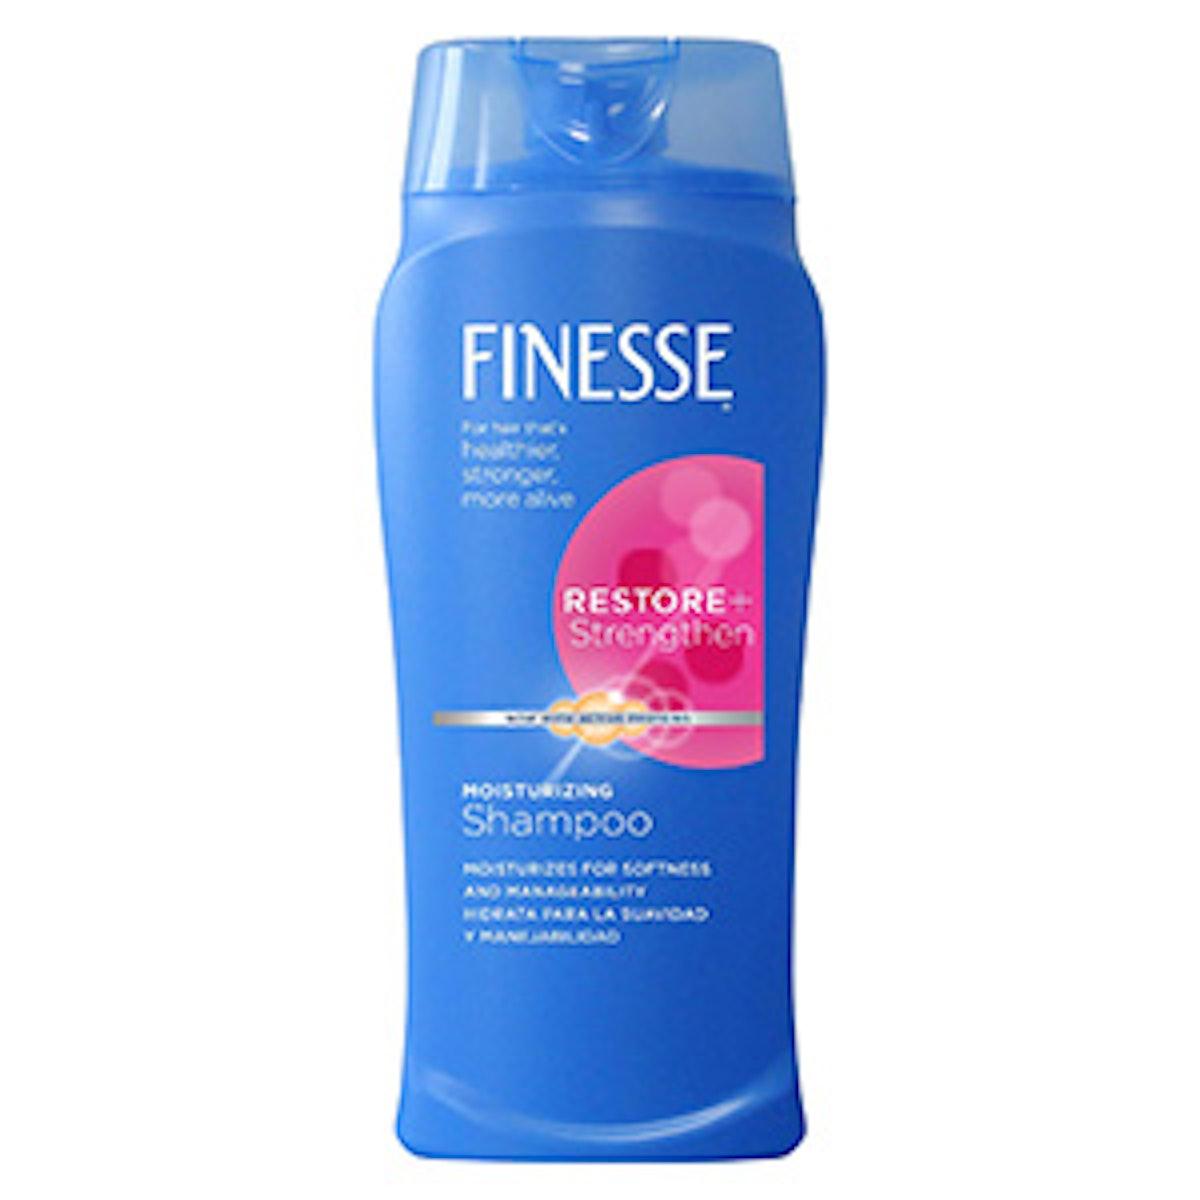 Finesse Restore + Strengthen Moisturizing Shampoo